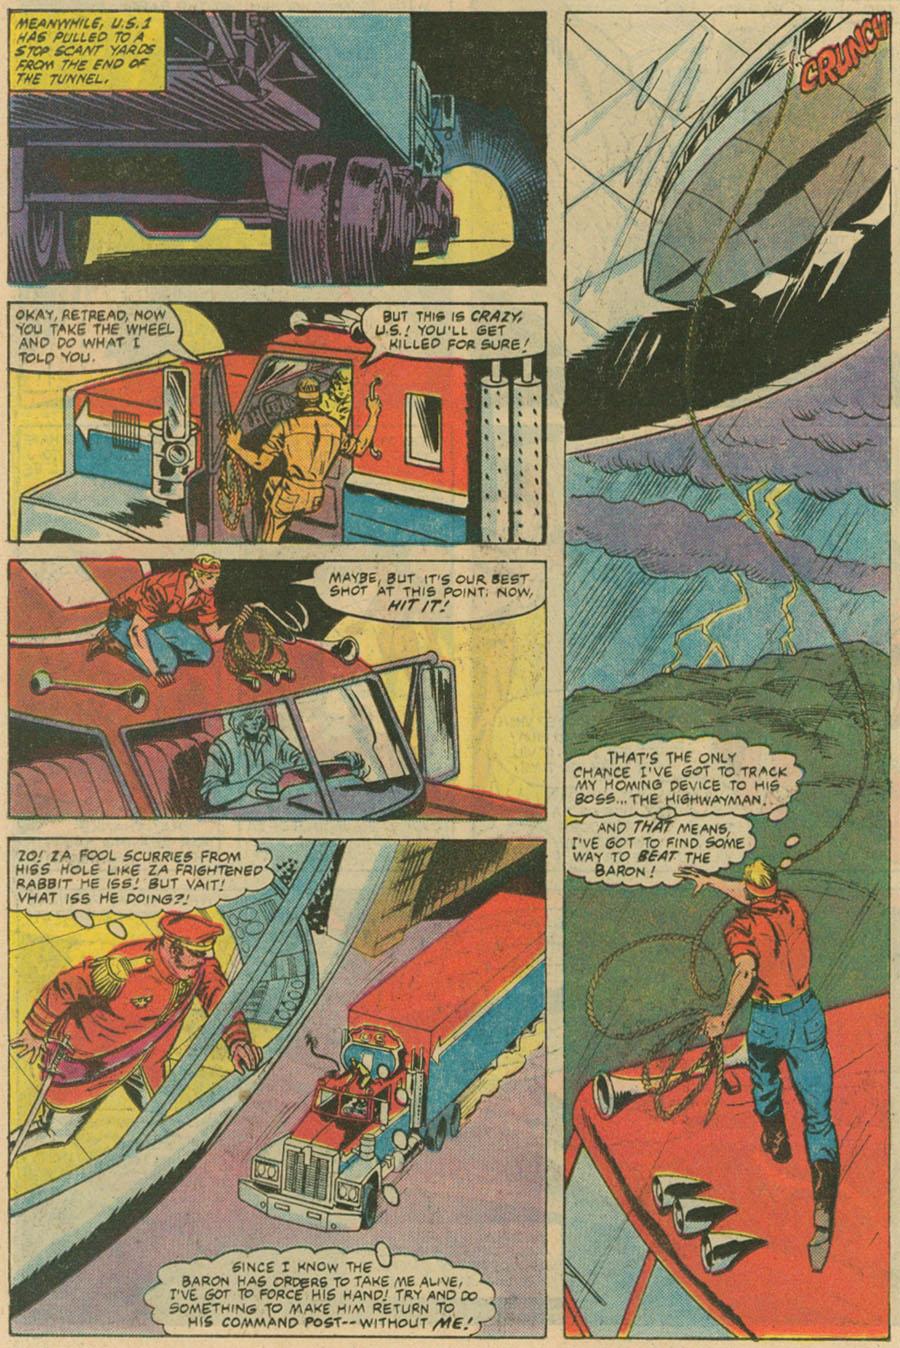 Read online U.S. 1 comic -  Issue #4 - 19